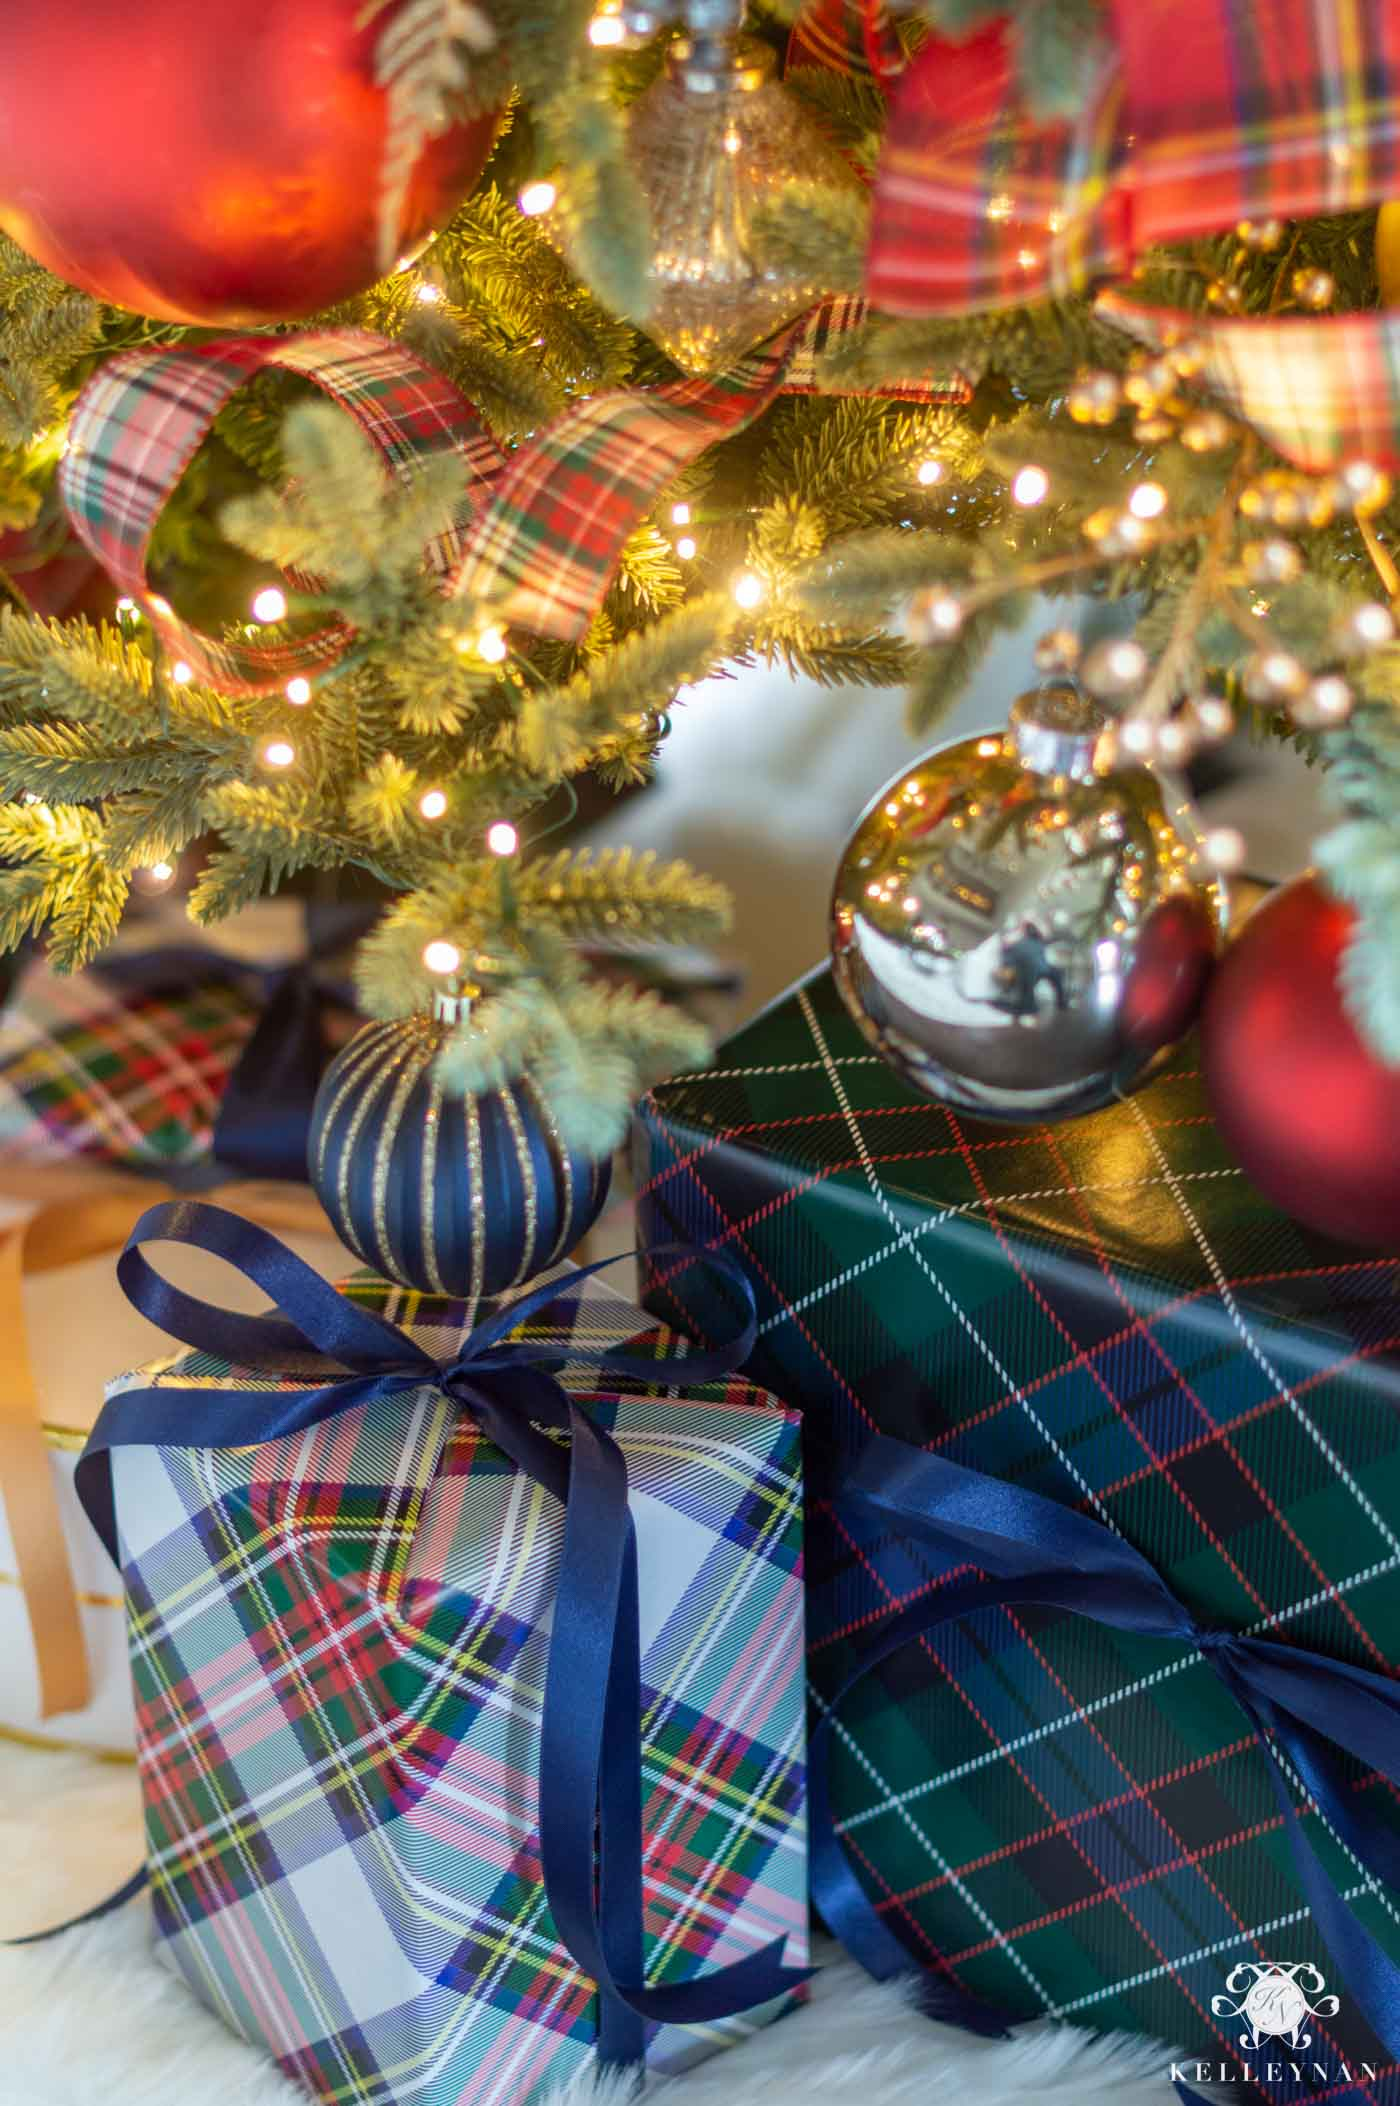 Plaid Tartan Gift Wrap Ideas